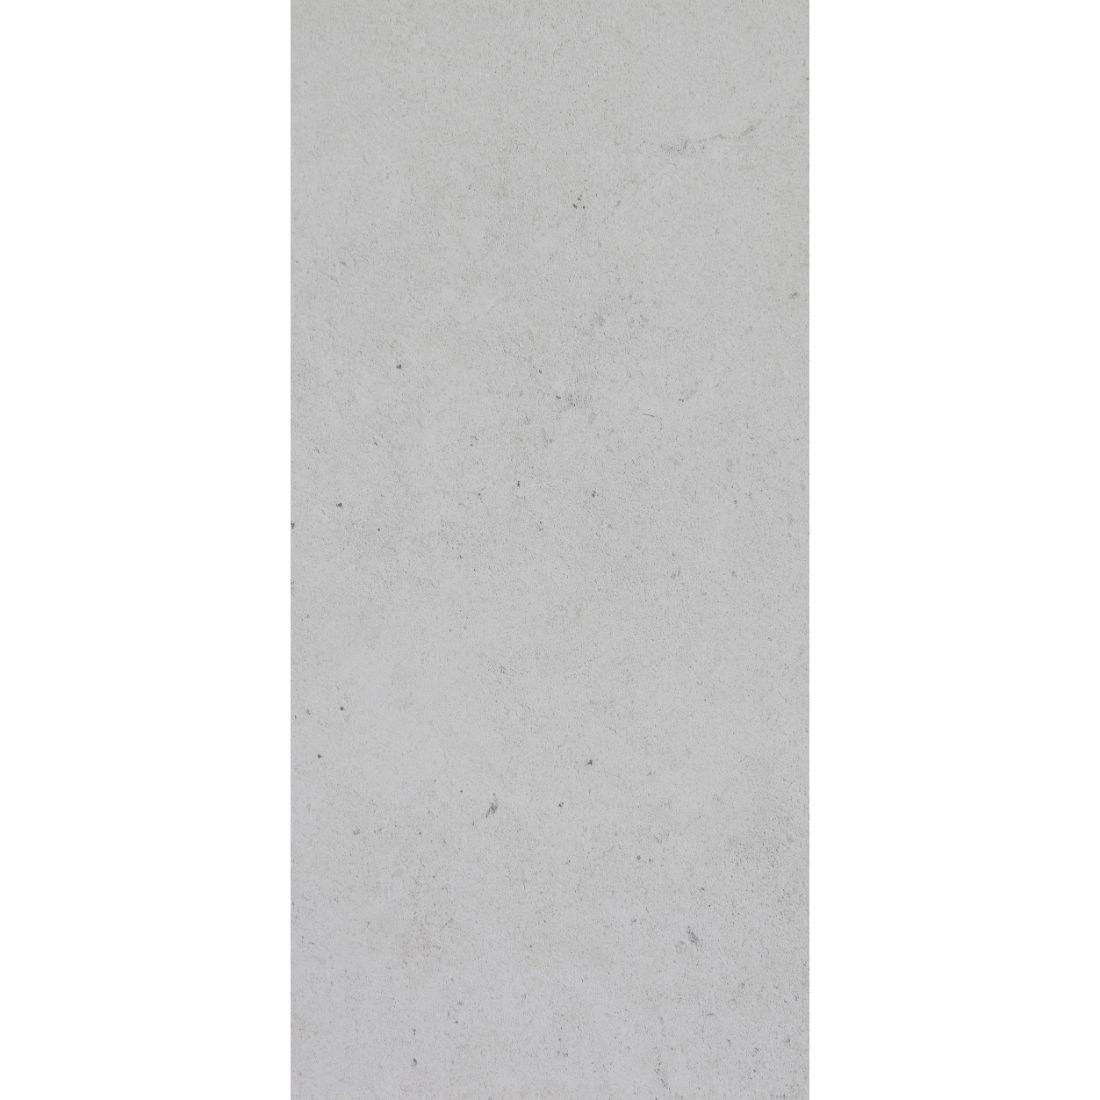 Aqua Wall Lining Panel Concrete Matte 2400 x 1200 x 4.5mm